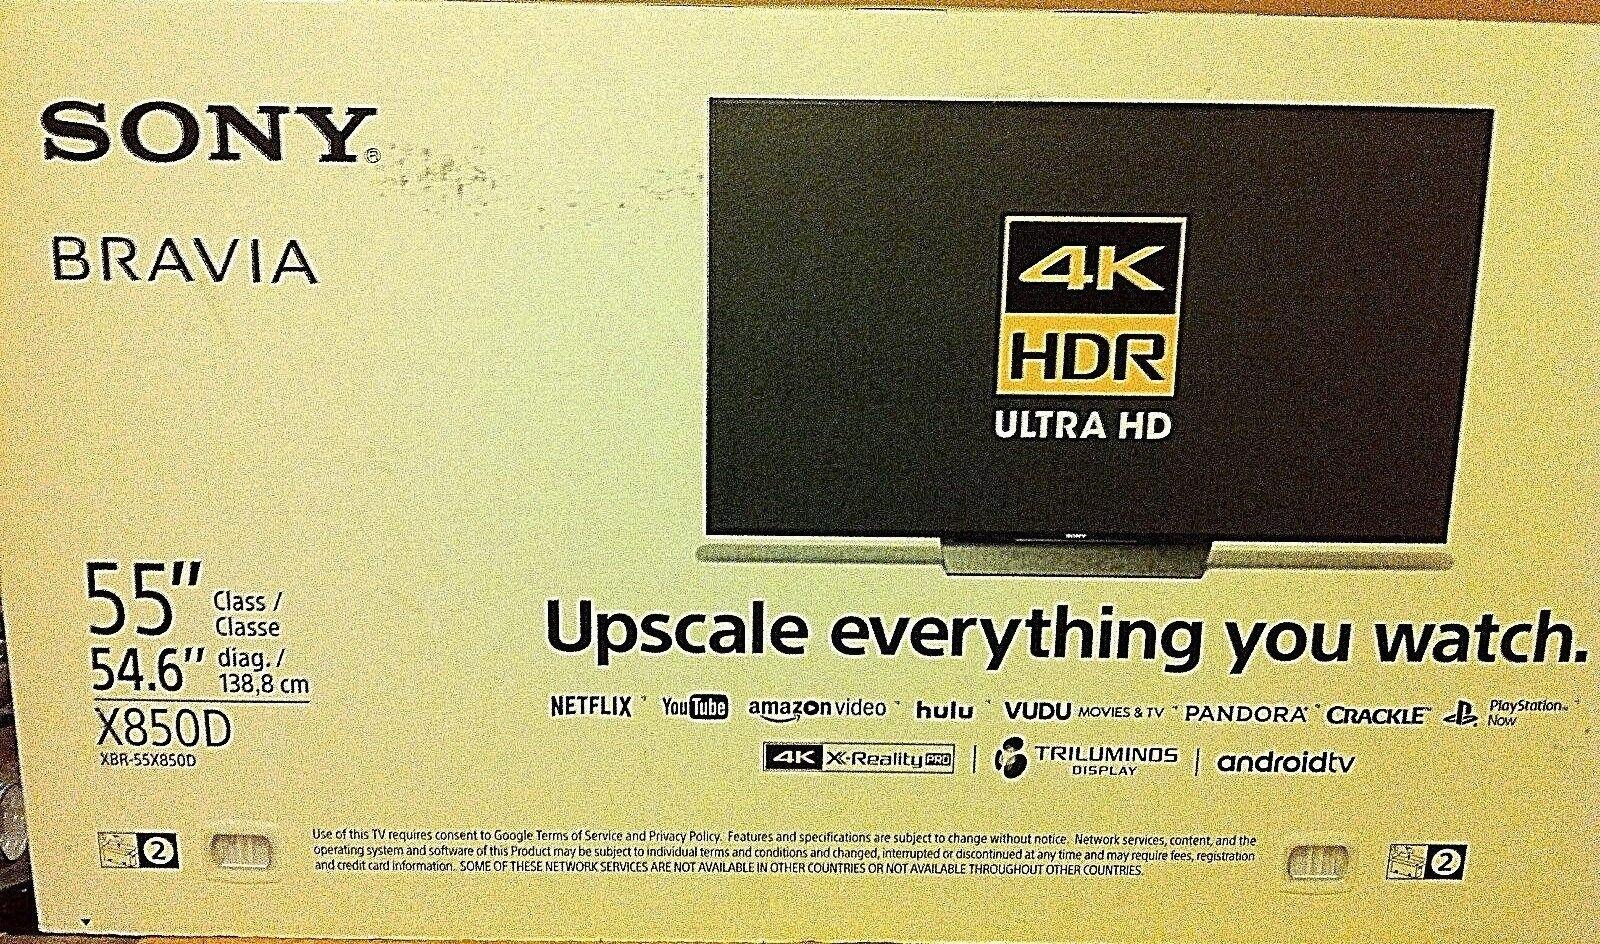 "Sony XBR-55X850D 55""4K UHD Motionflow 120HZ HDR Smart TV 2017 Model XBR55X850D"